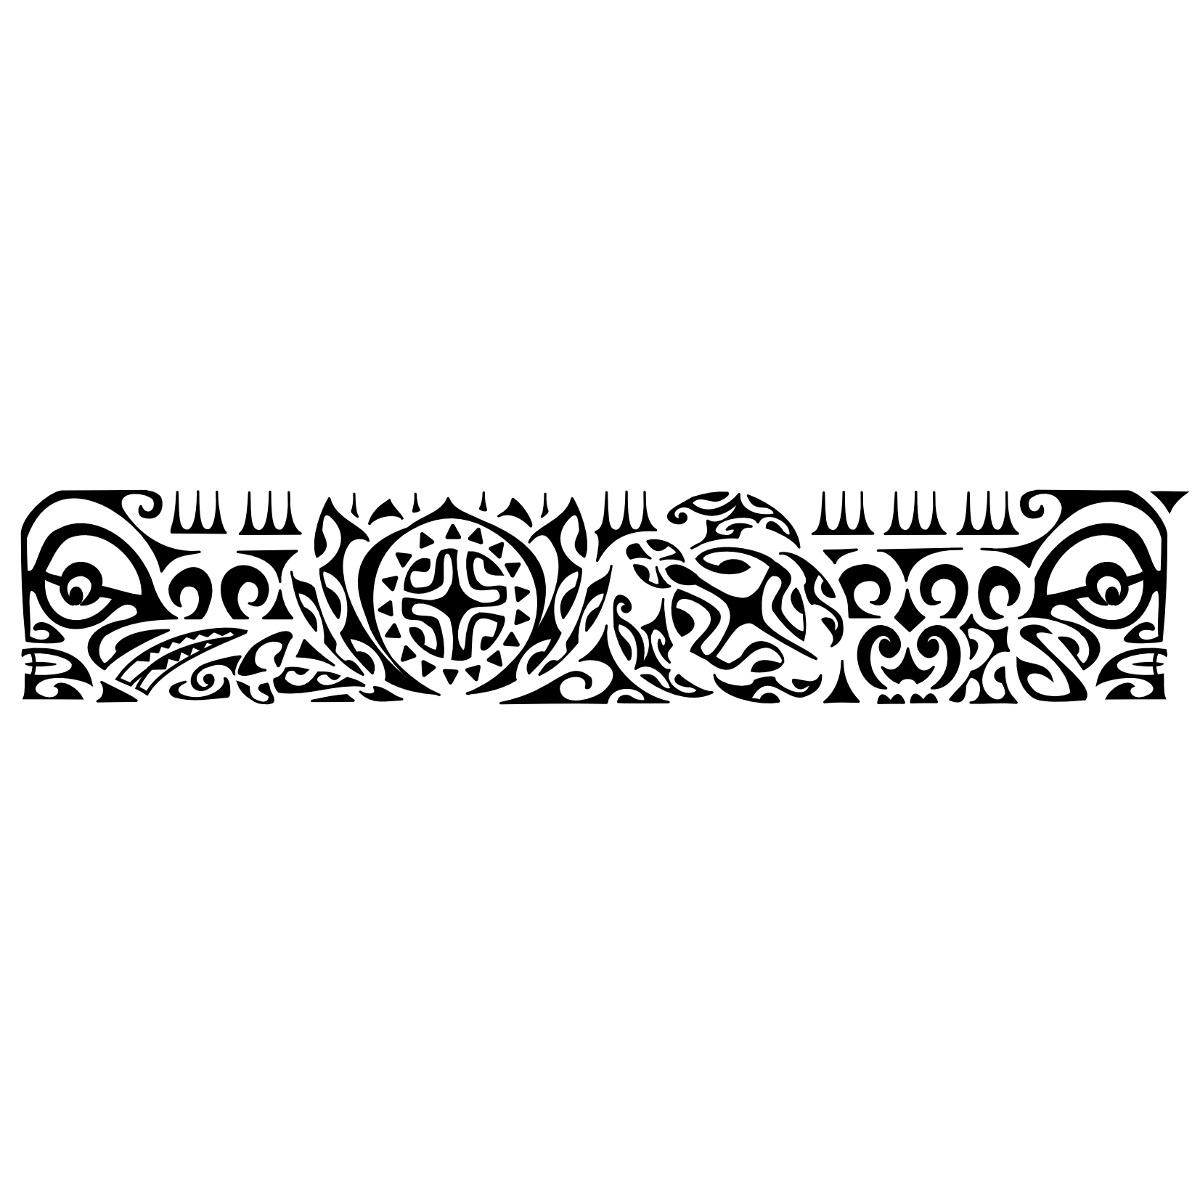 Bracelet maorie signification